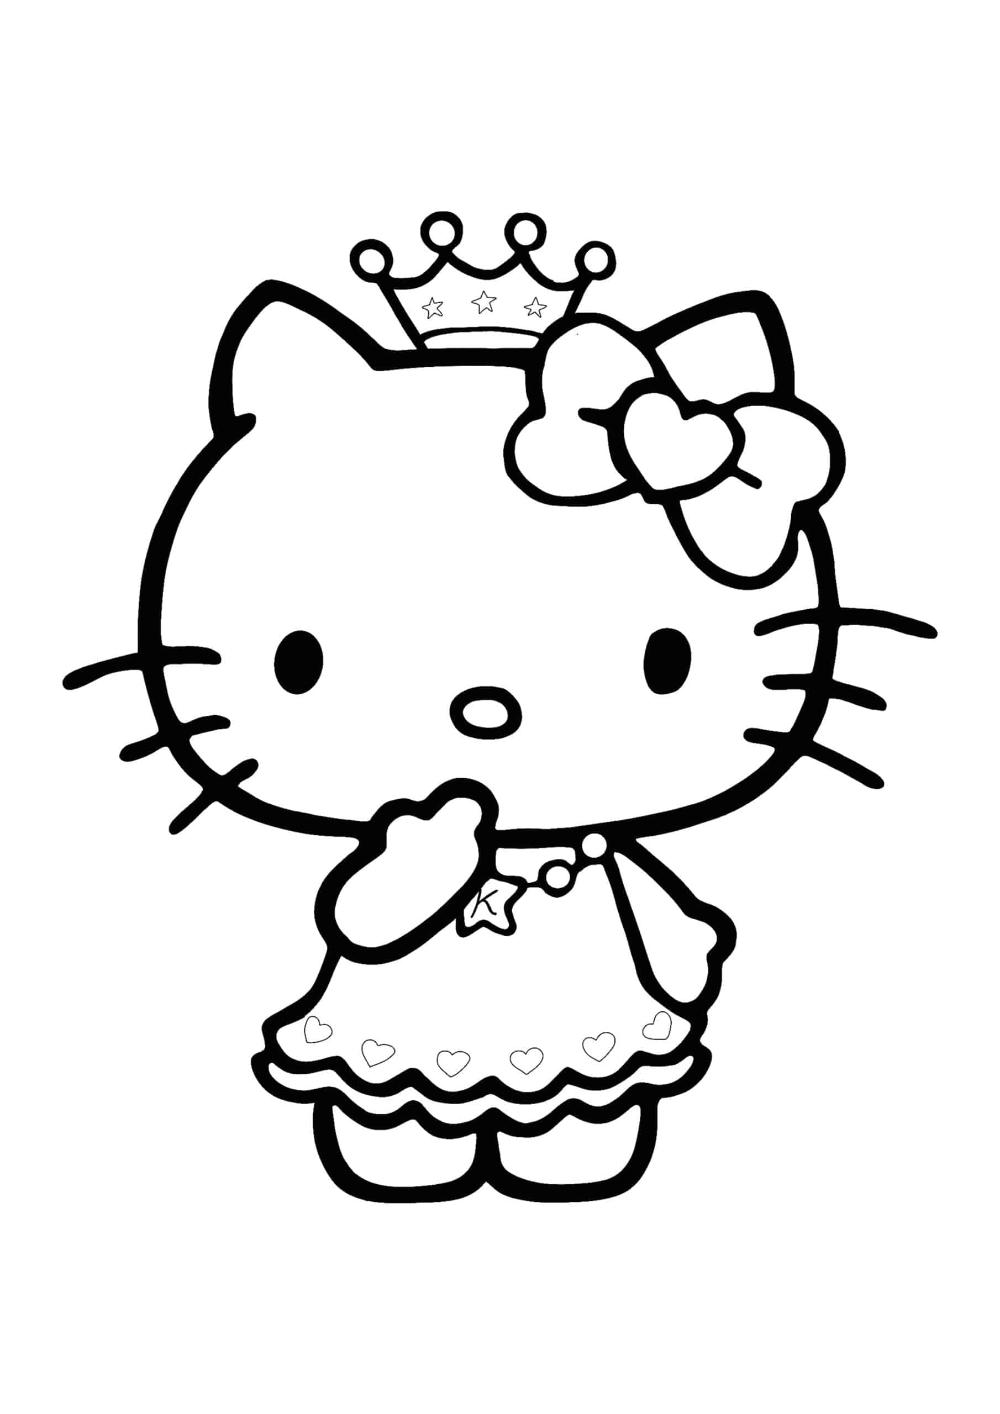 Hello Kitty Princess Coloring Pages 2 Free Coloring Sheets 2020 Princess Coloring Pages Princess Kitty Princess Coloring